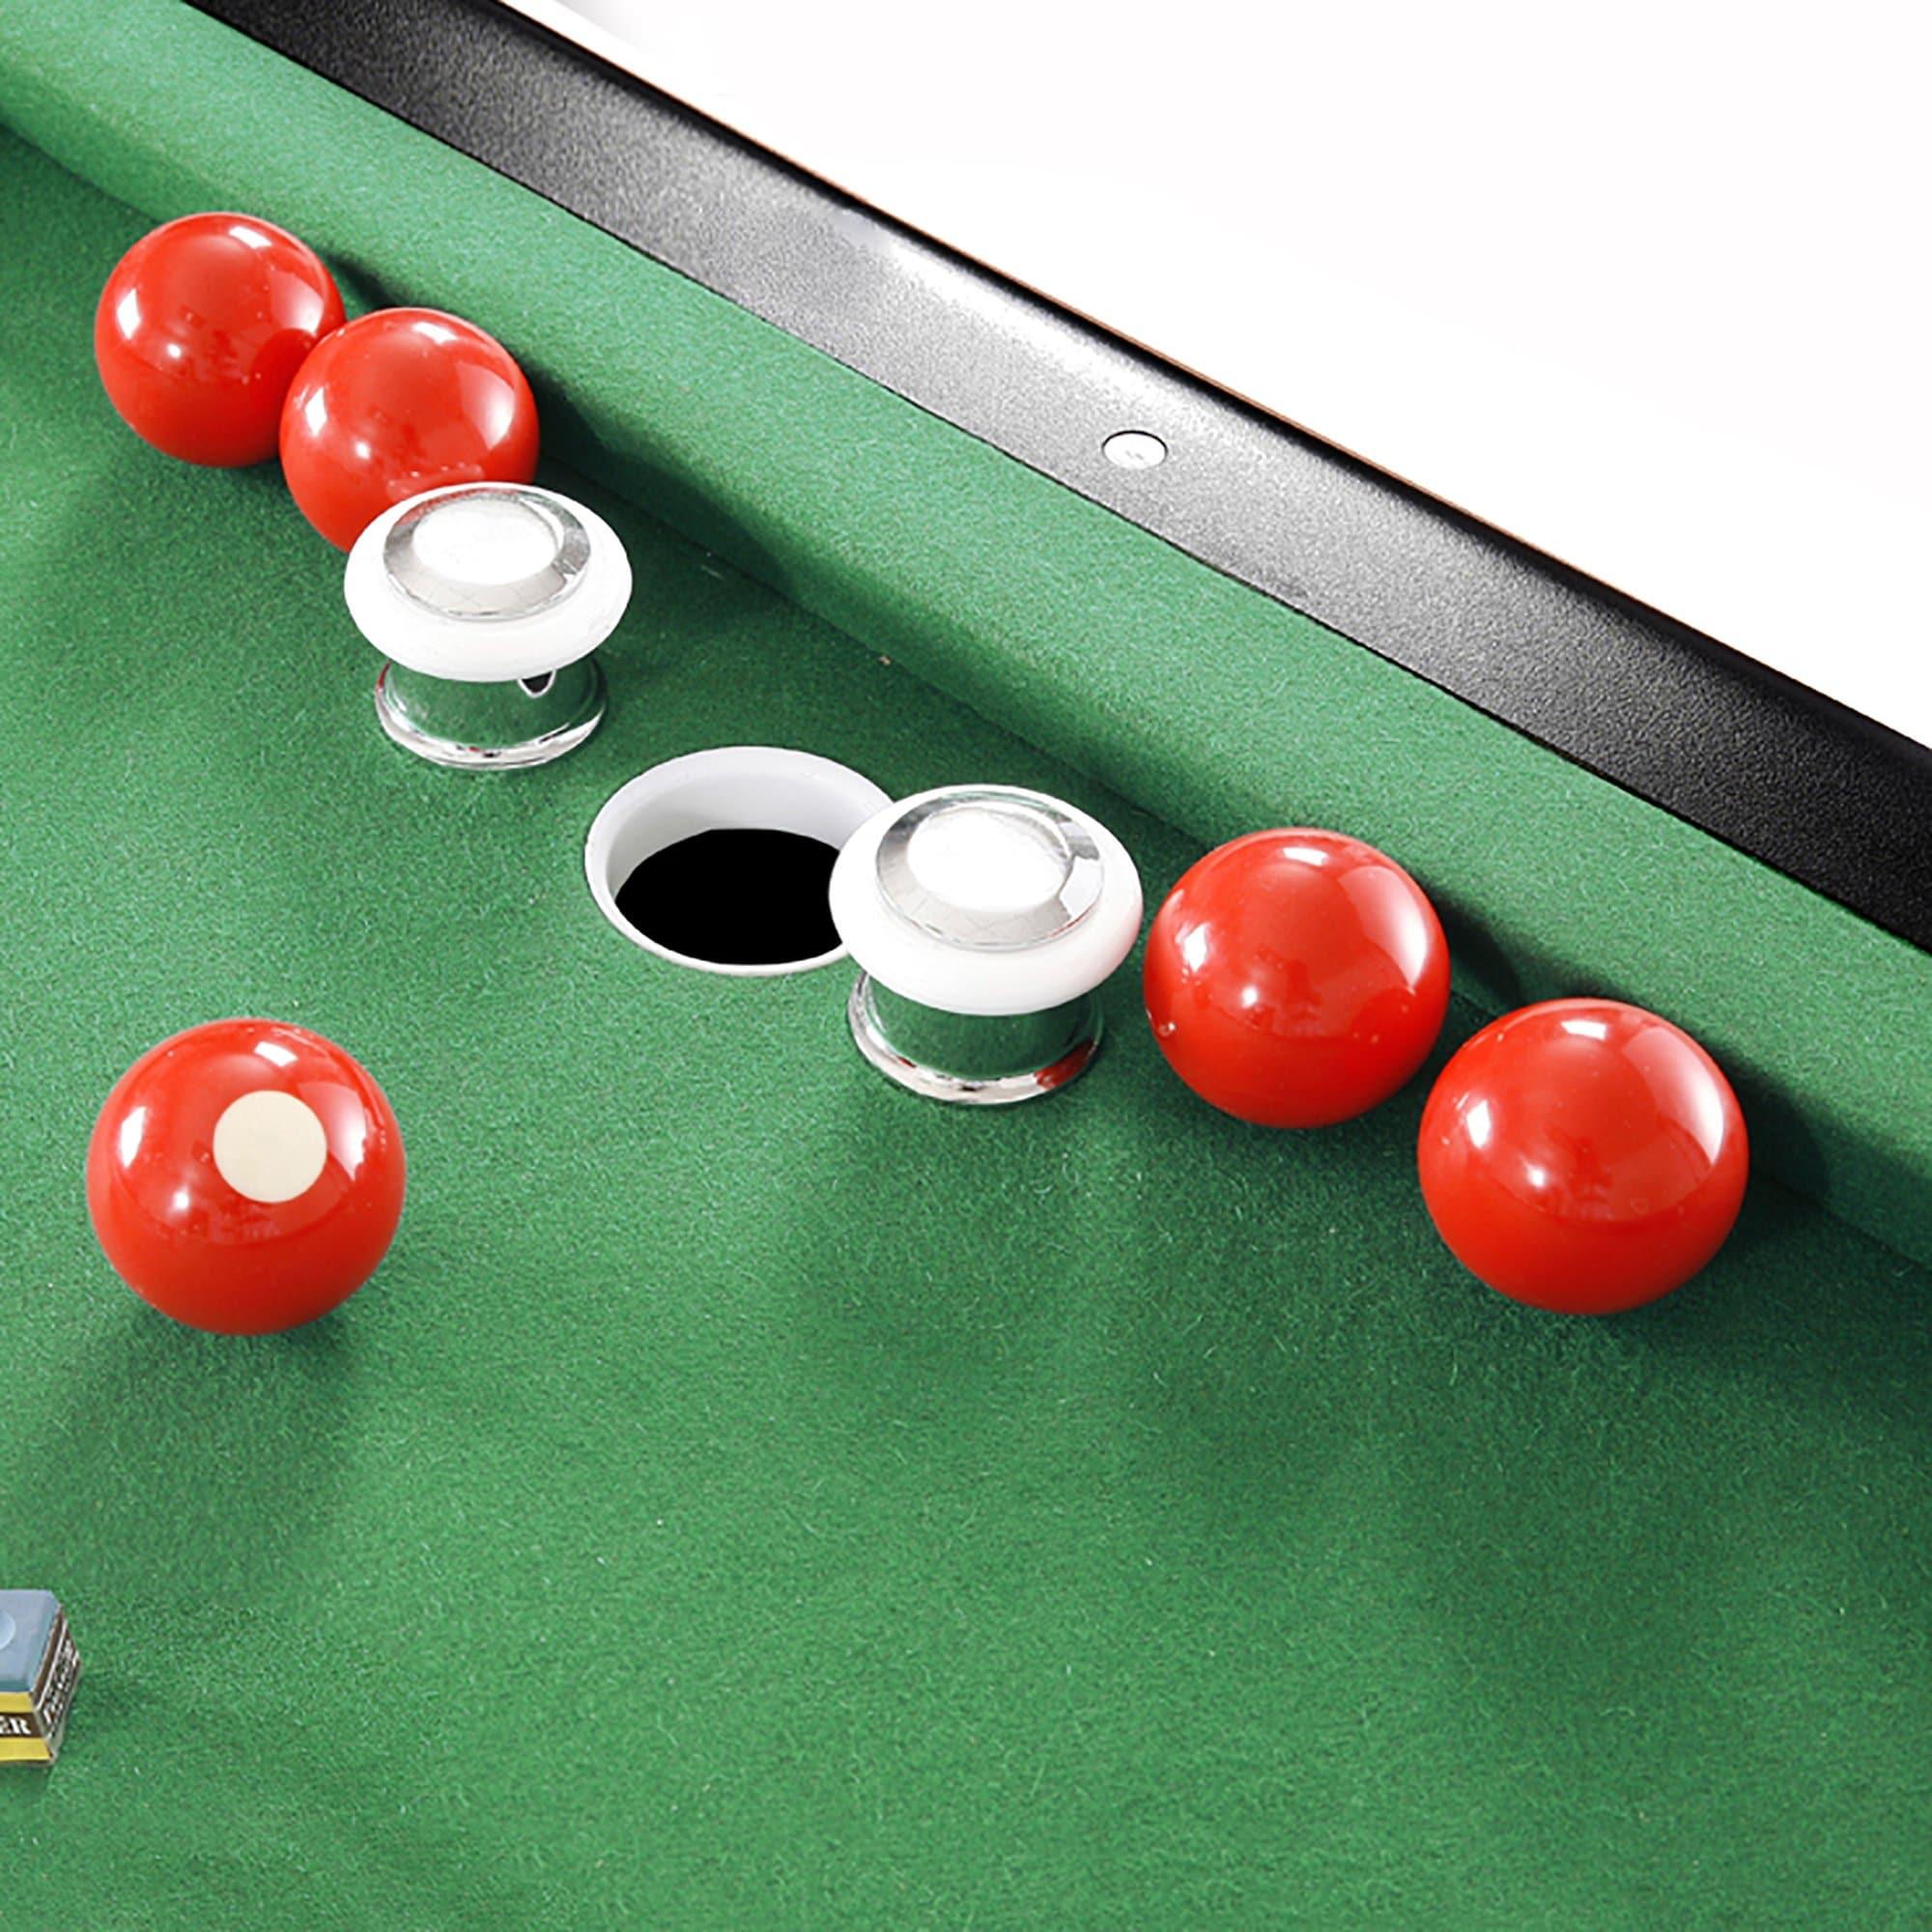 Renegade 54 In Slate Bumper Pool Table